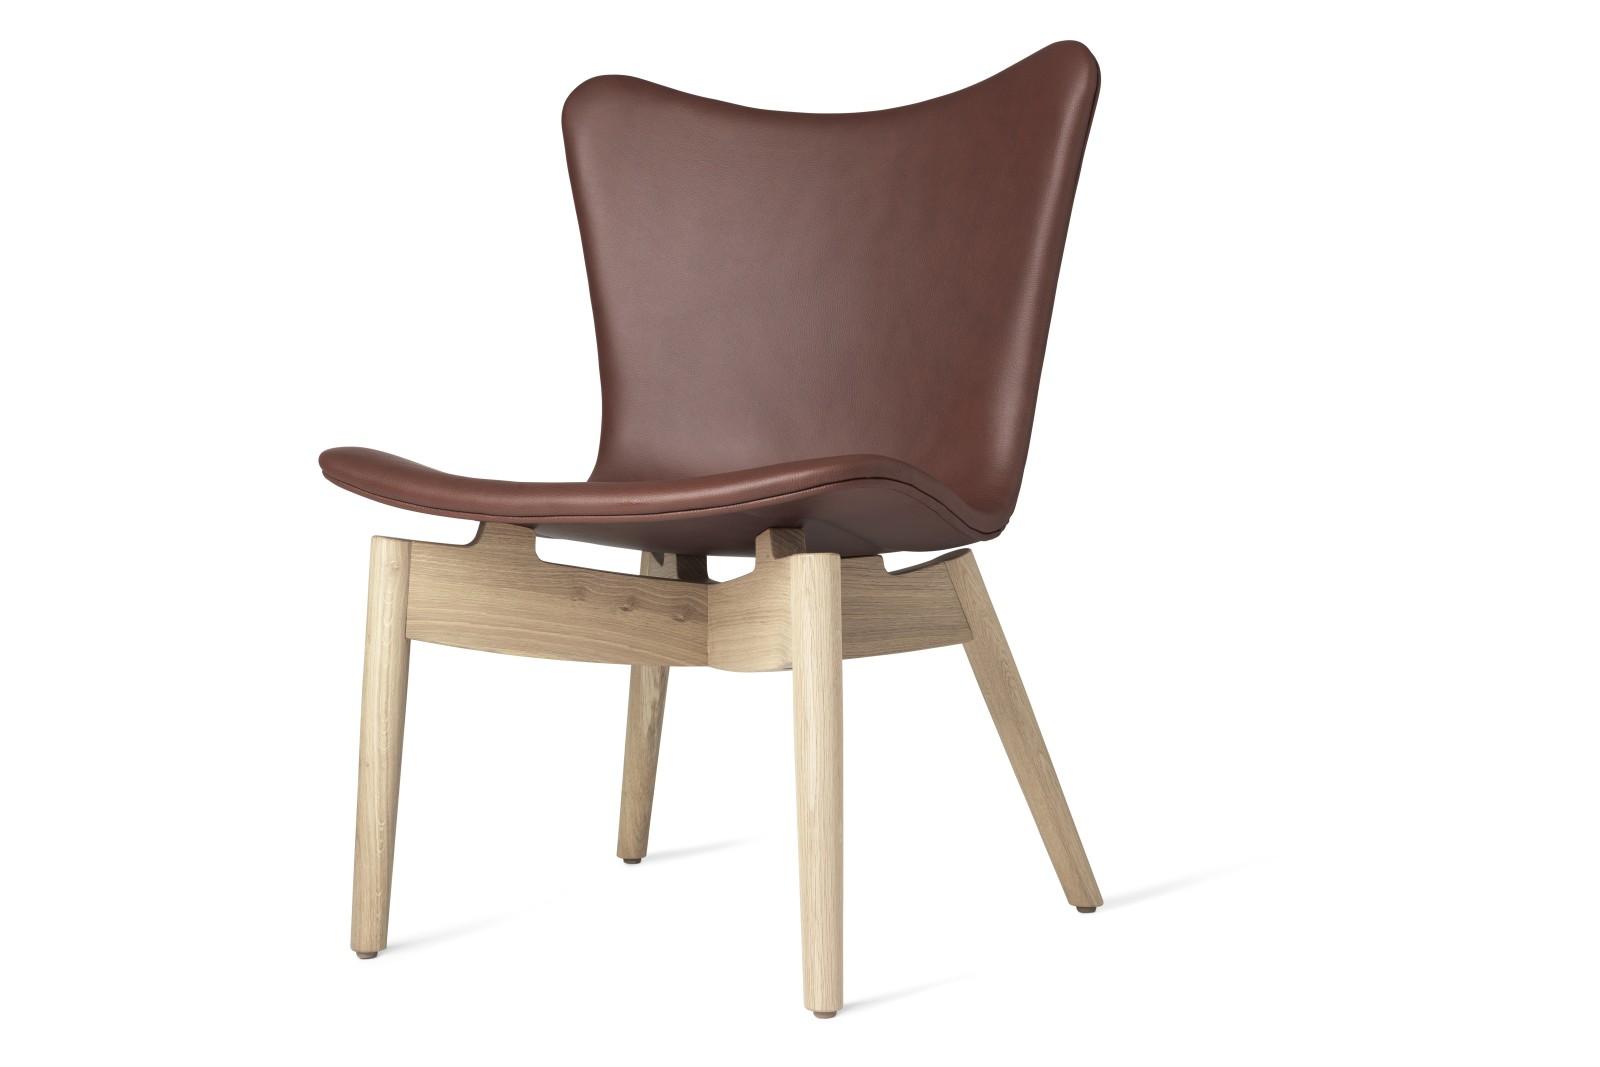 Shell Lounge Chair Ultra Cognac Leather, Matt Lacquered